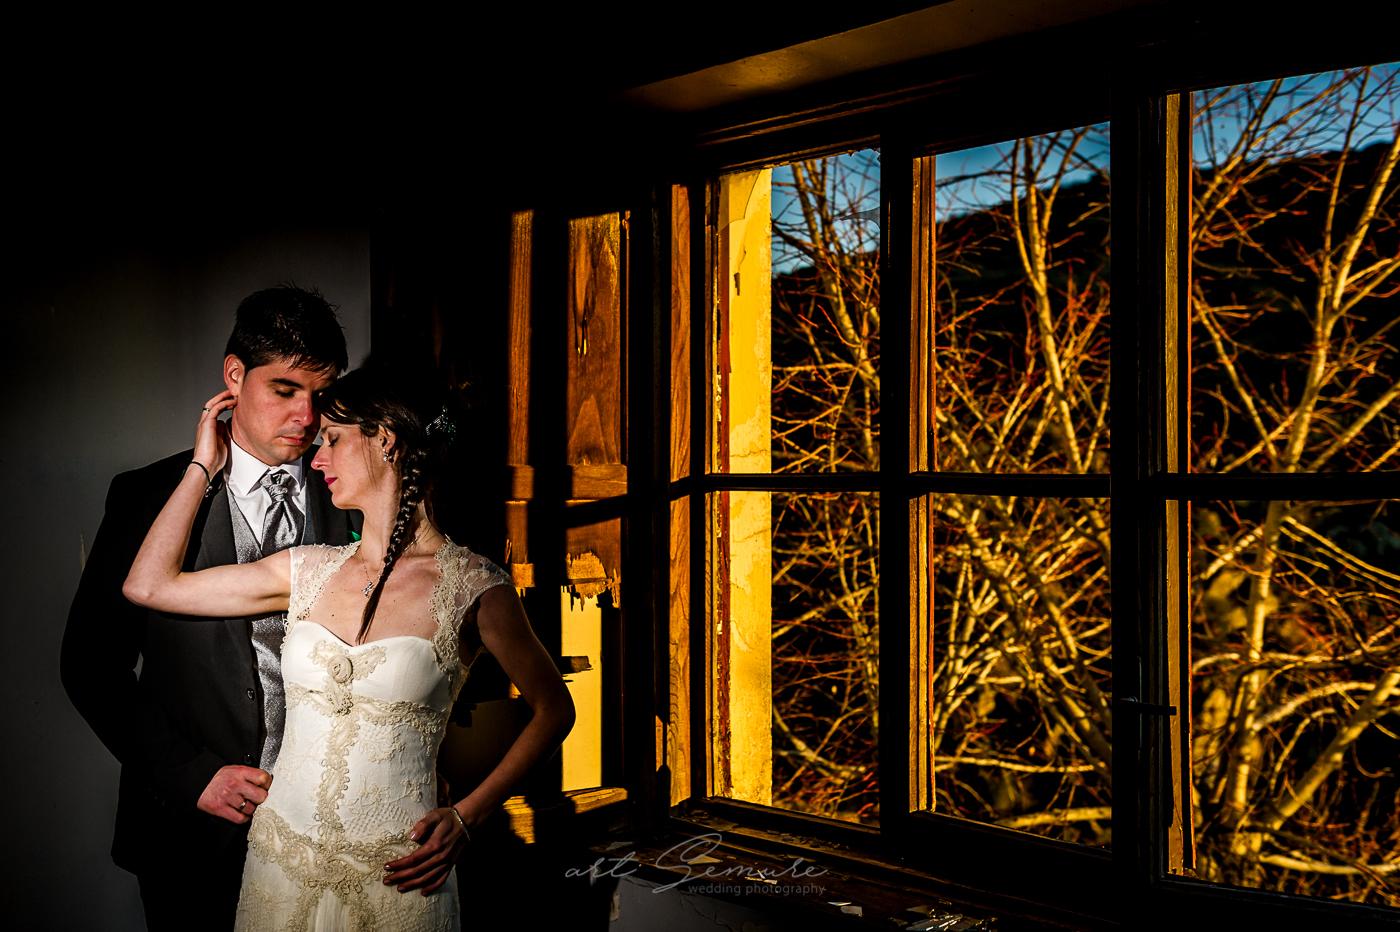 fotografo boda emotiva zamora salto de castro 21_